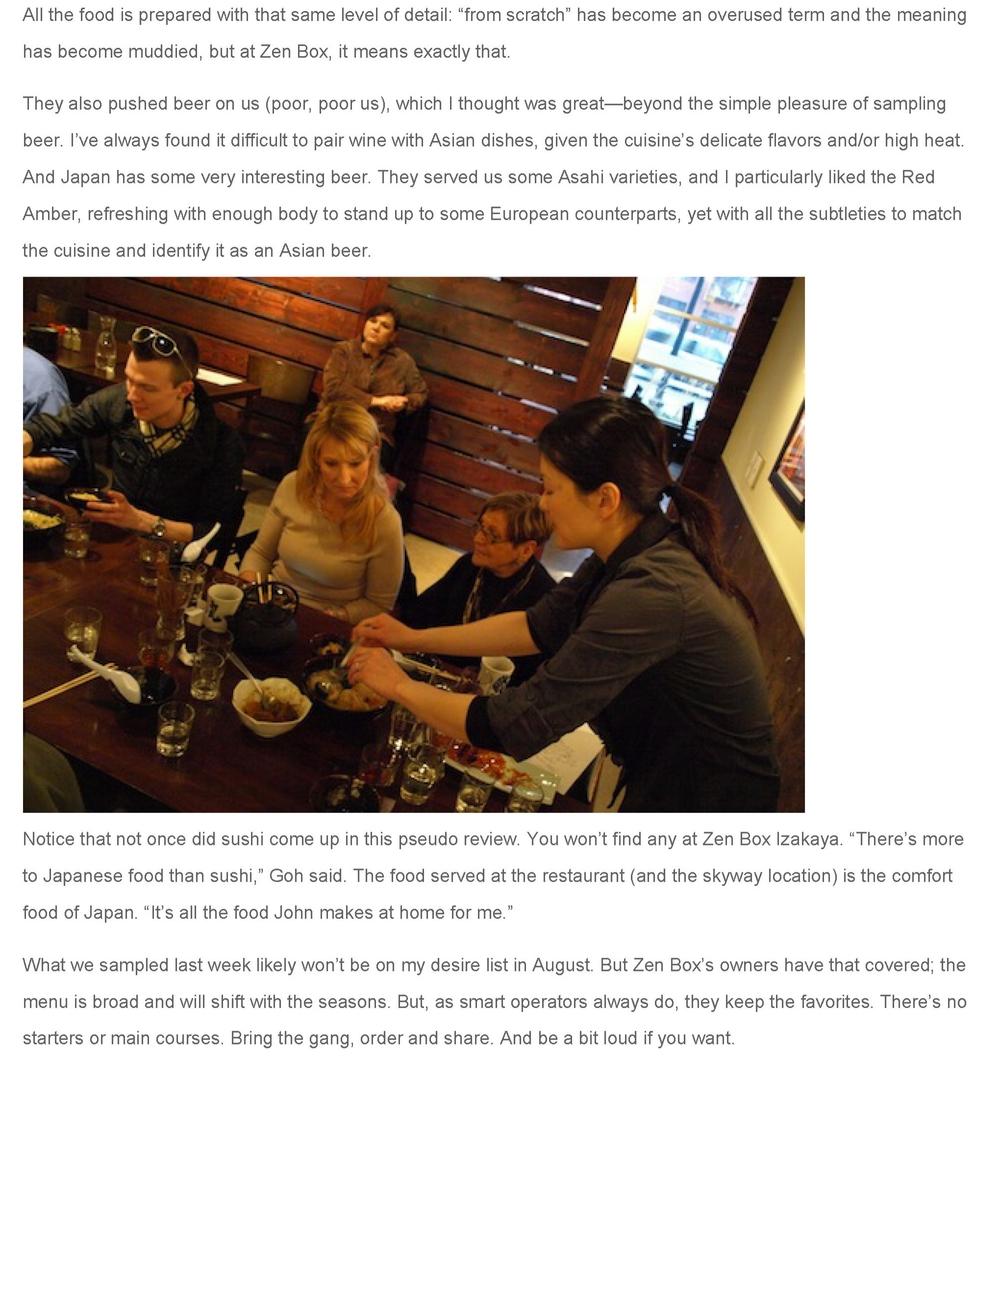 Zenbox_FoodServiceNews_20120203_Page_3.jpg